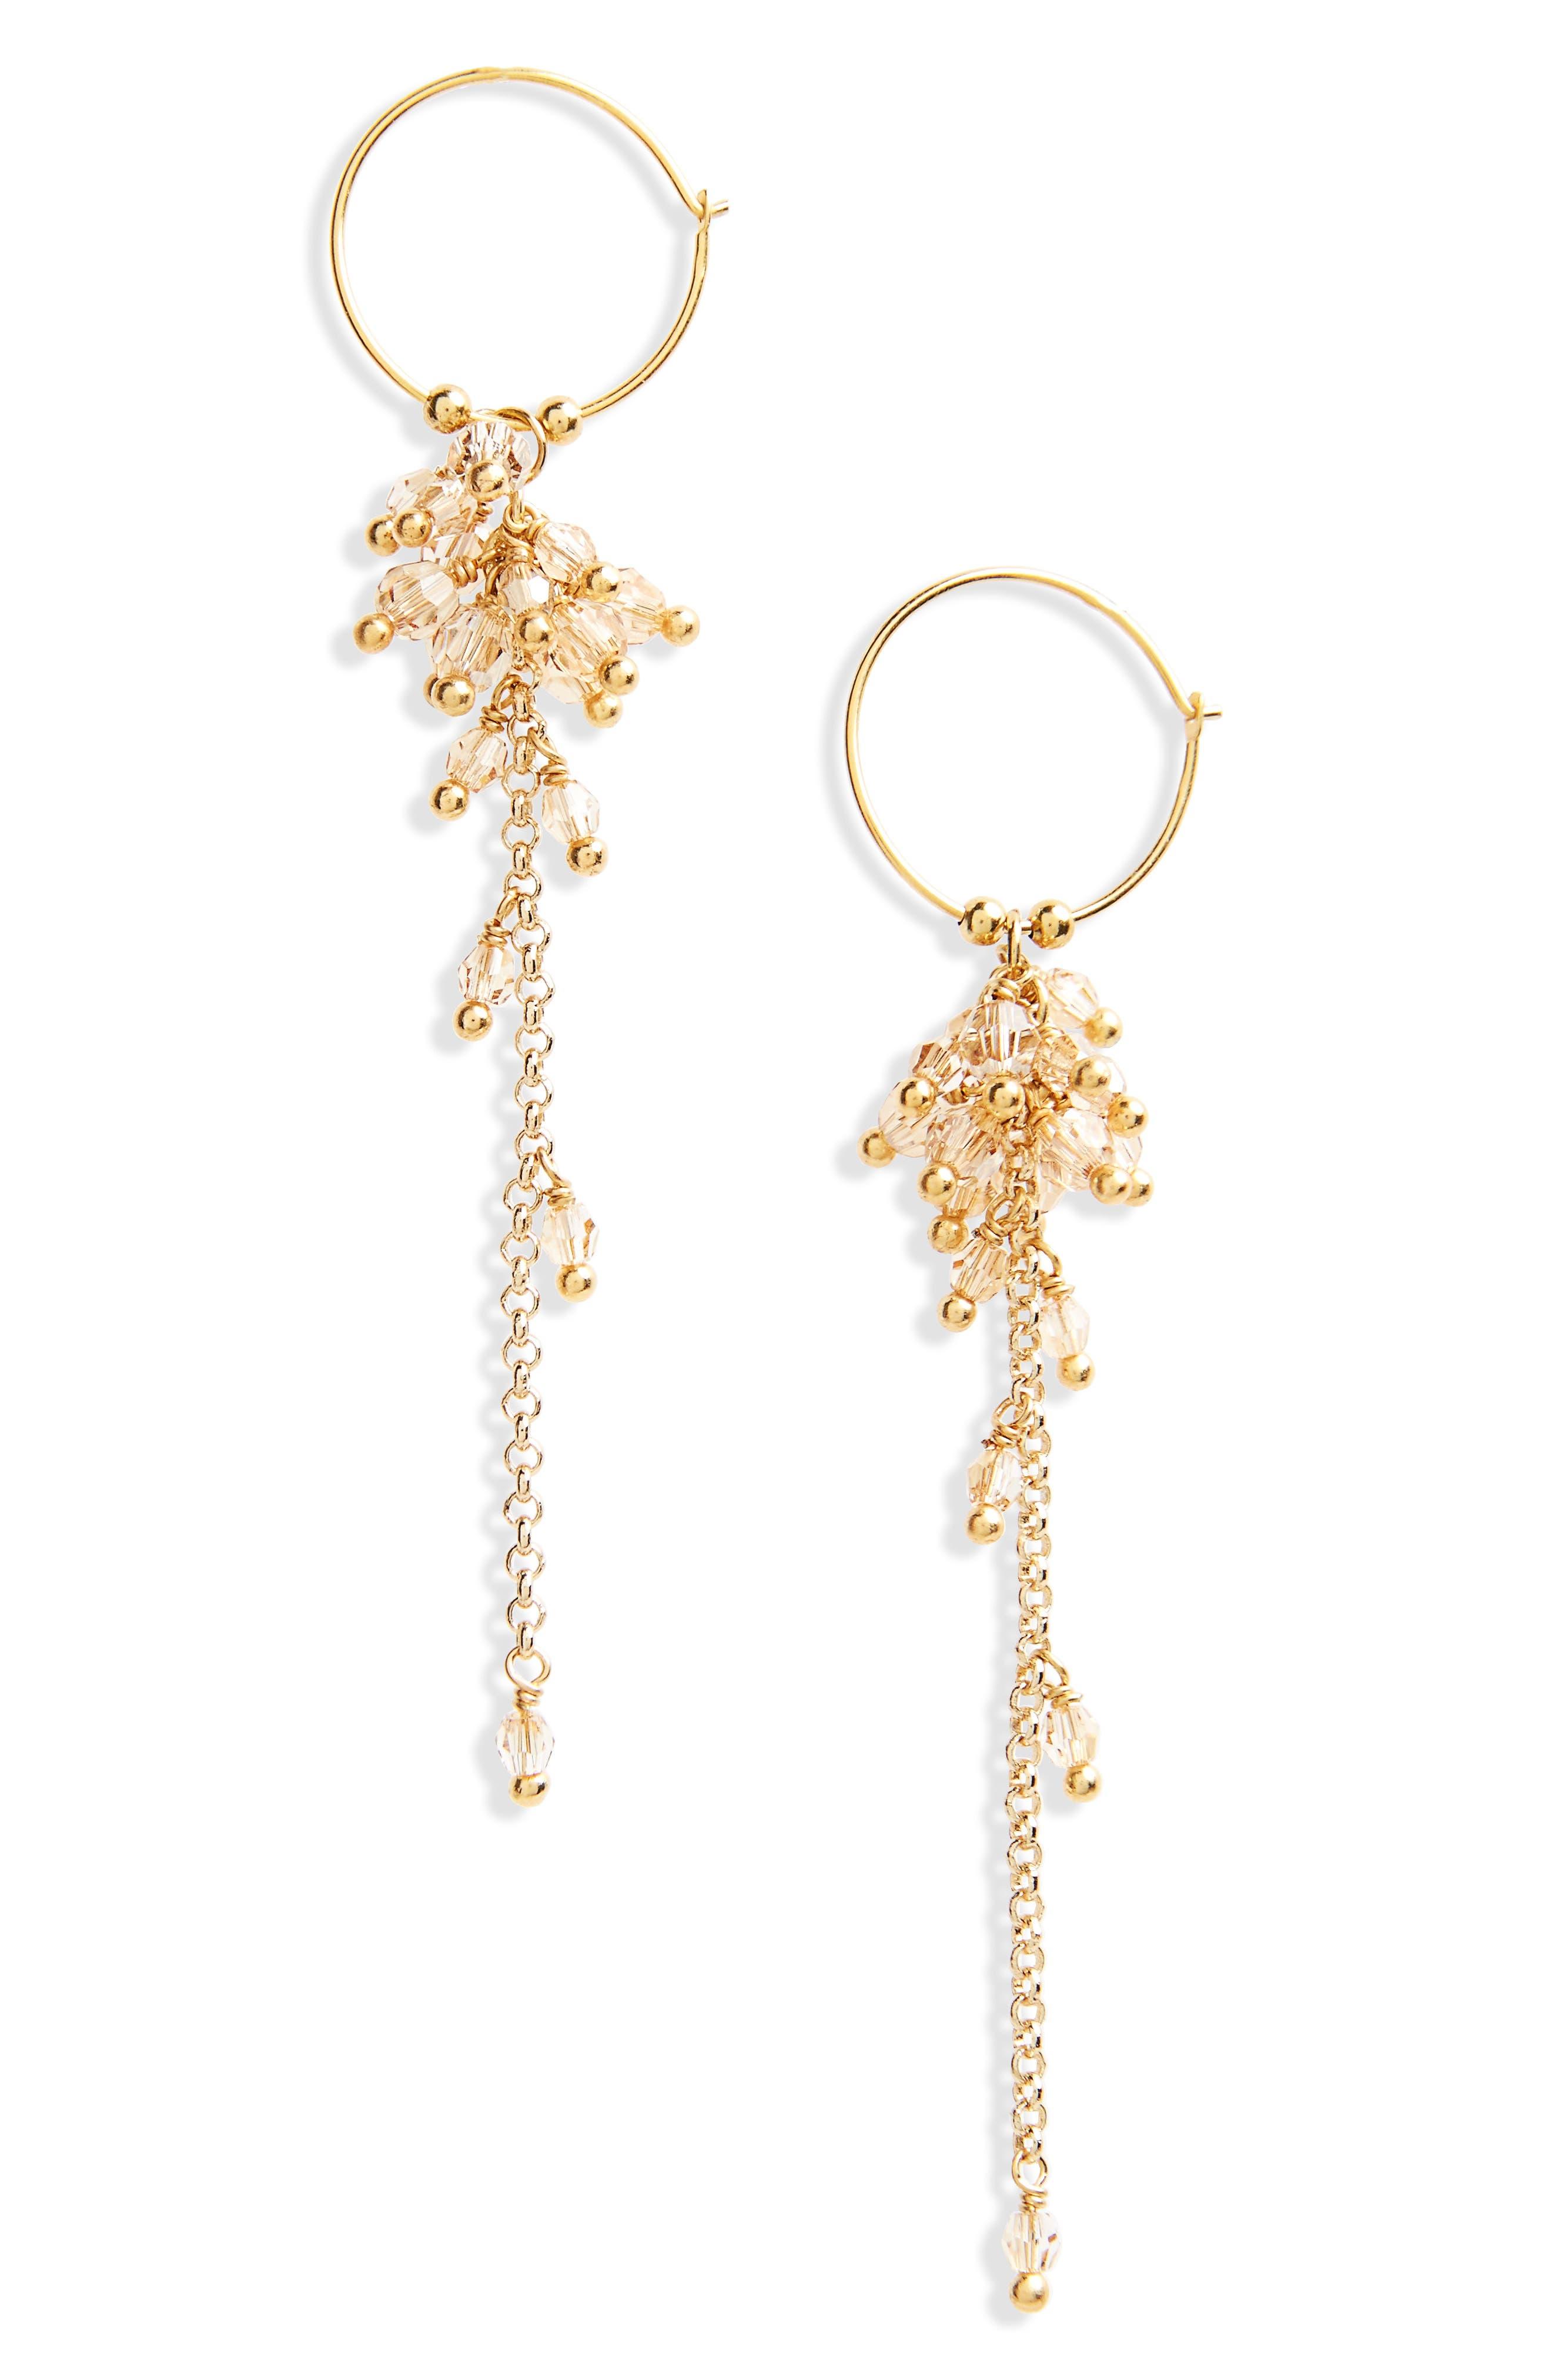 Crystal Cluster Hoop Earrings,                             Main thumbnail 1, color,                             Golden Shadow